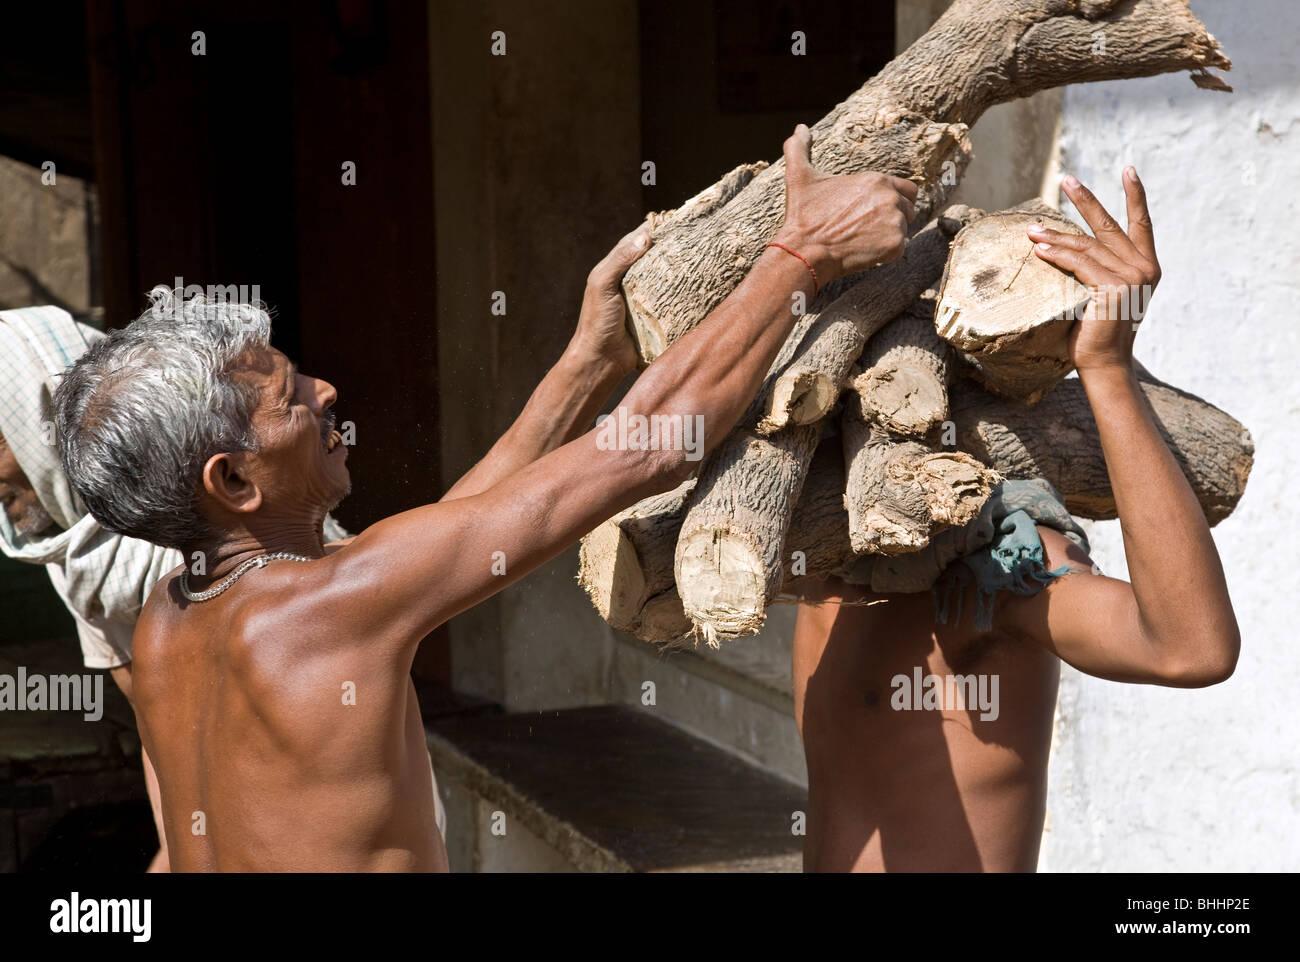 Outcast men carrying wood for the ritual corpse cremation. Manikarnika Ghat. Varanasi. India - Stock Image